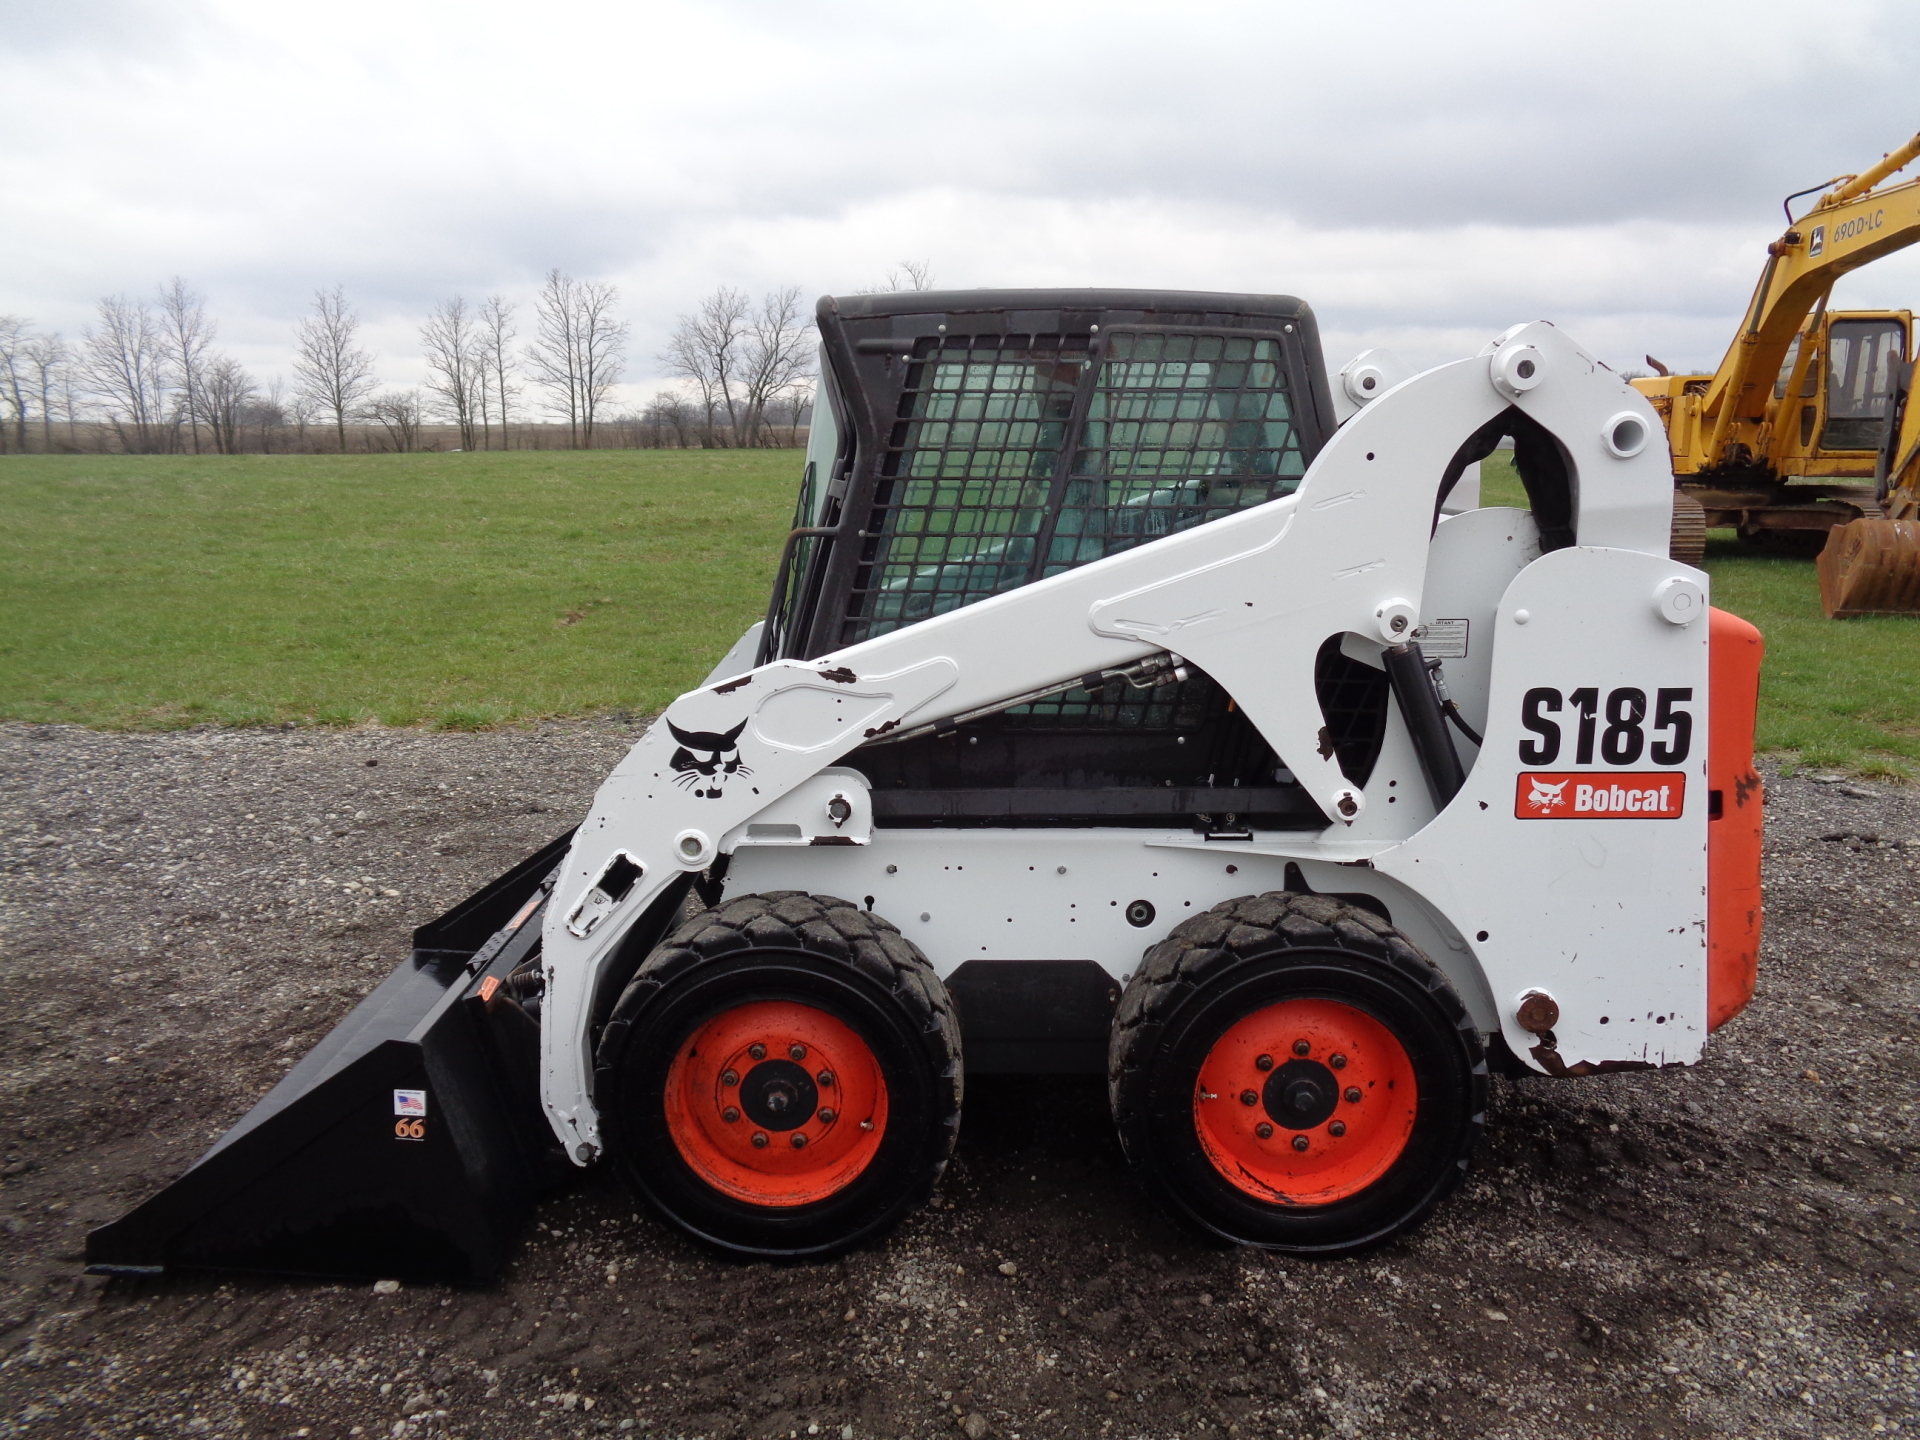 2011 Bobcat S185     $23,900